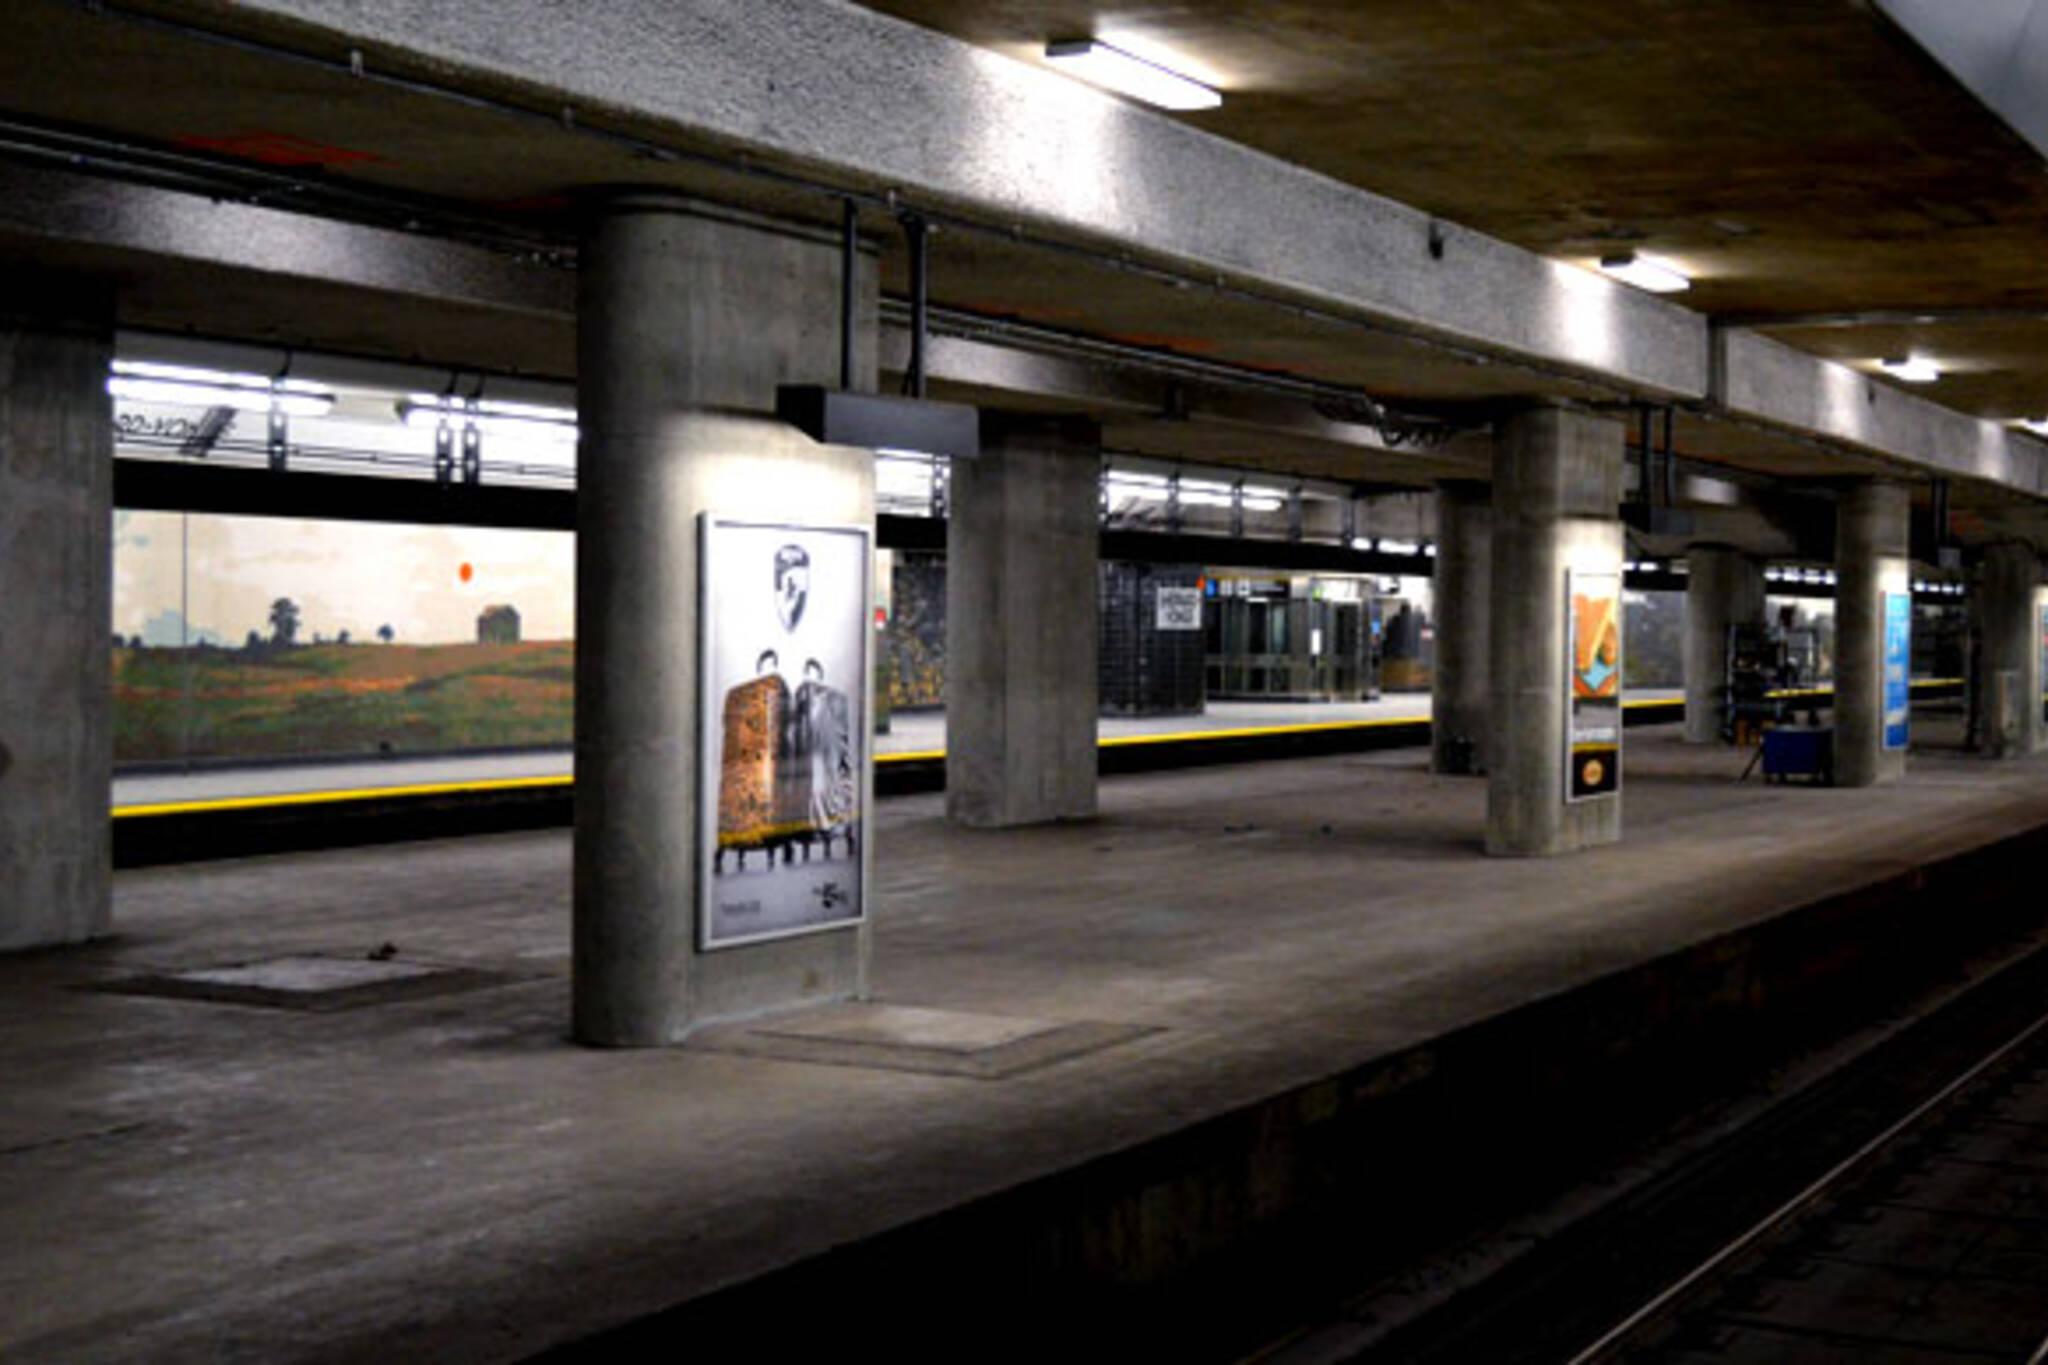 toronto sheppard station